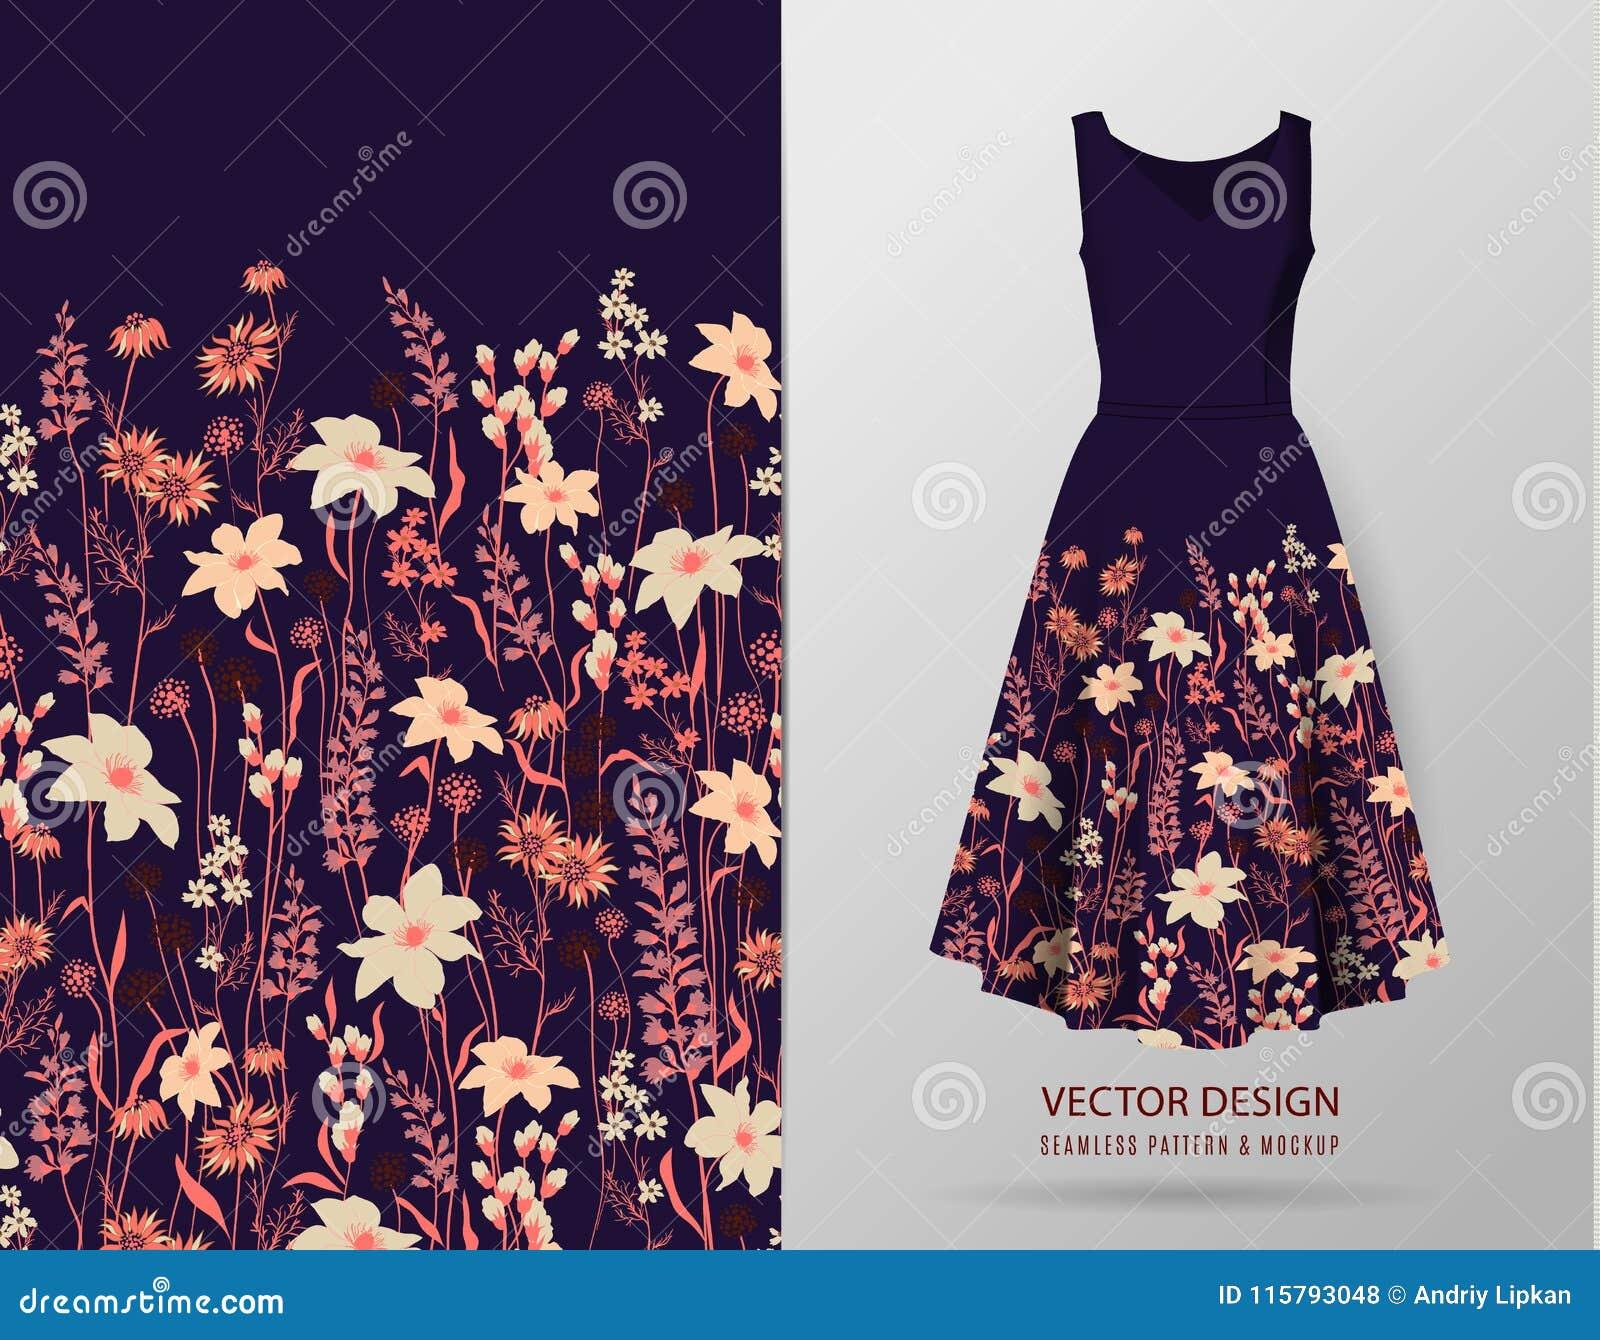 Seamless rim. Border with Herbs and wild flowers, leaves. Botanical Illustration Colorful illustration on dress mockup.